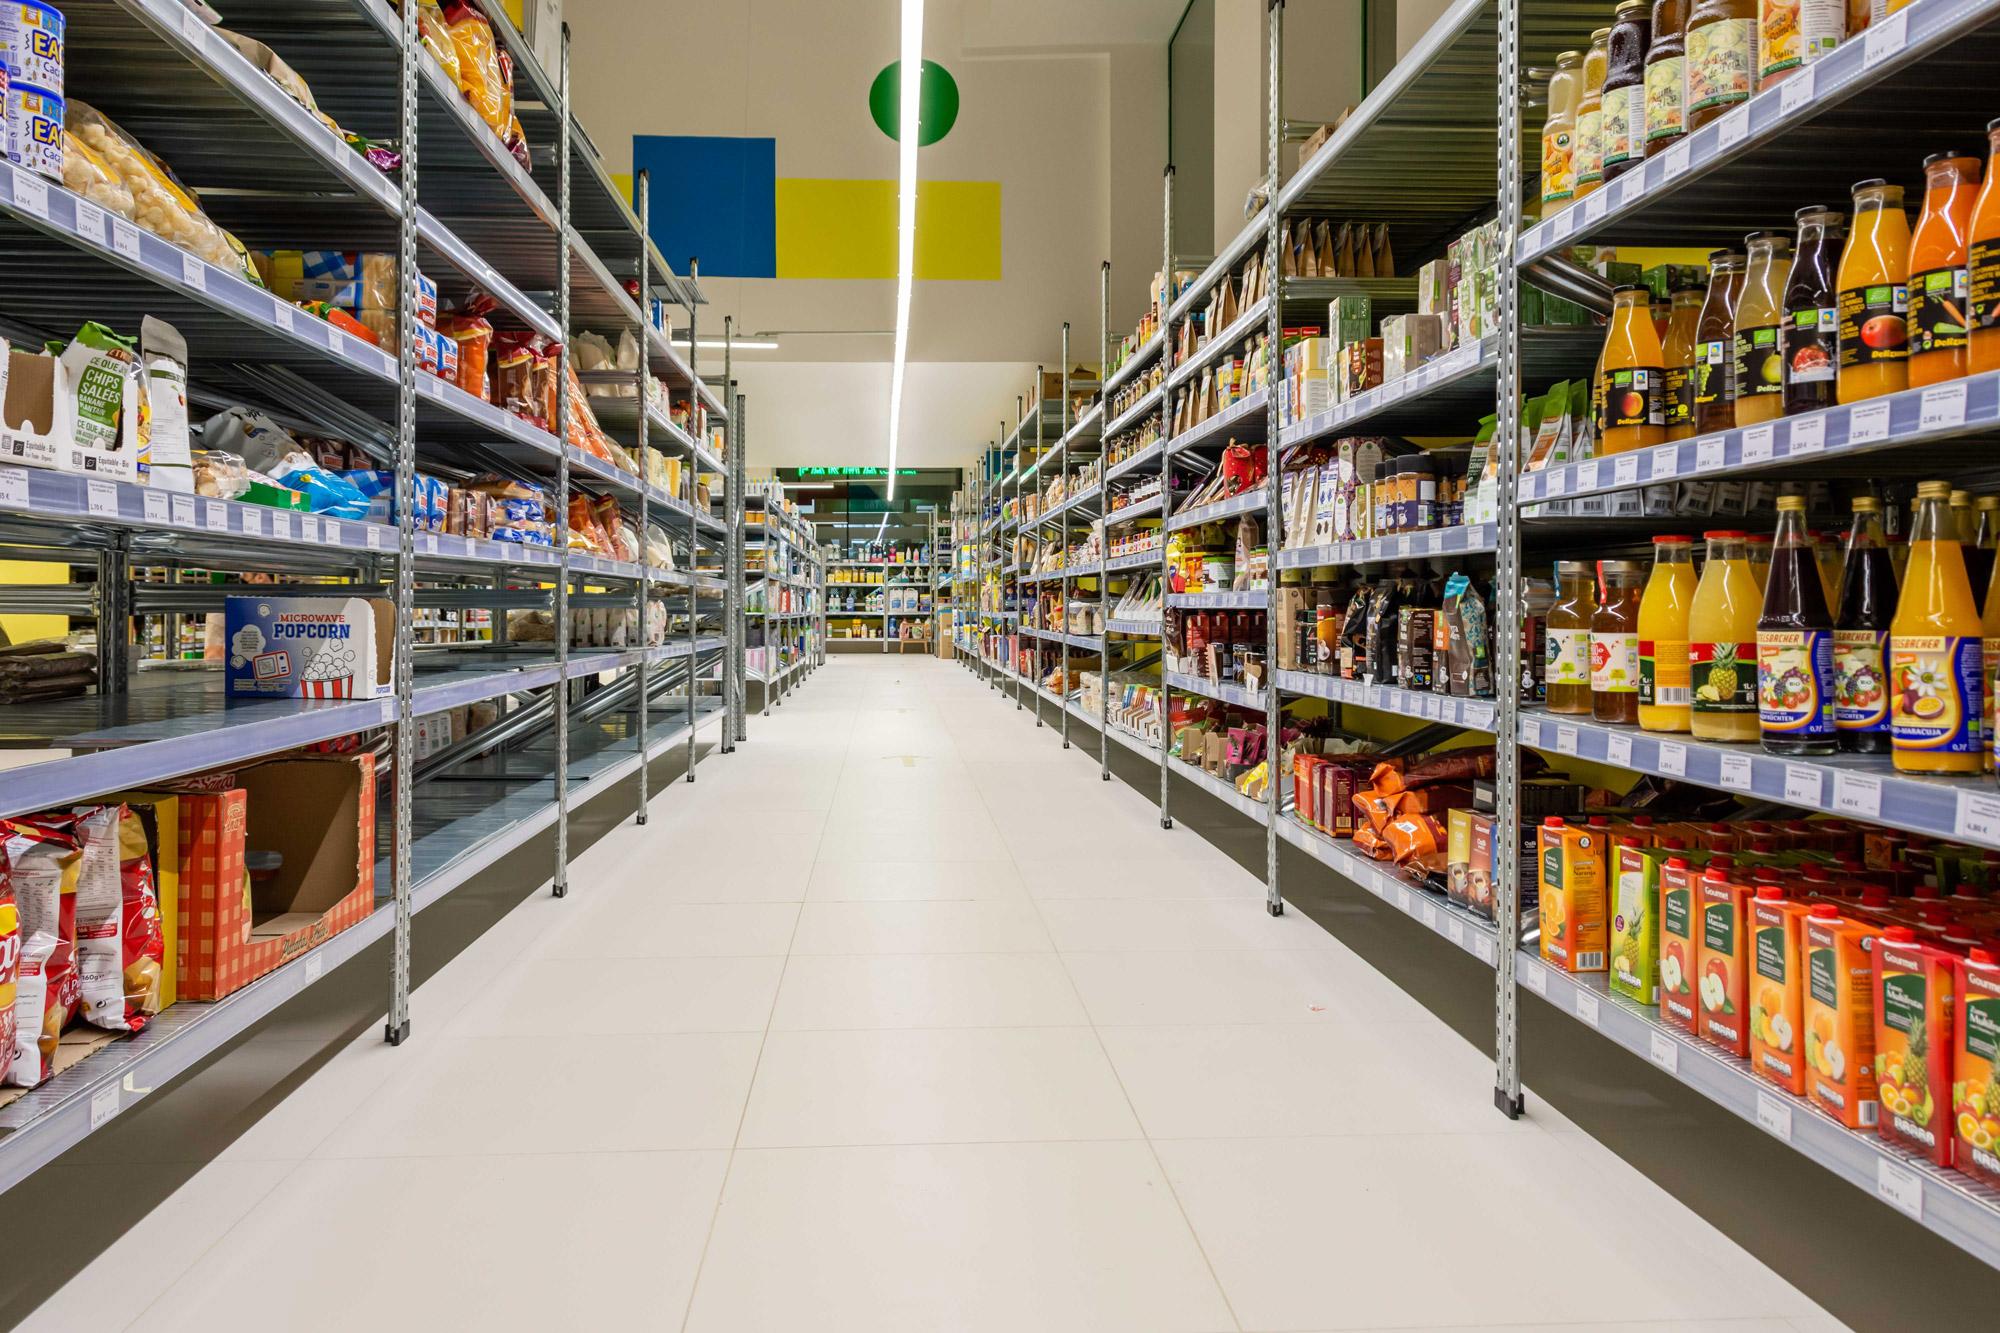 Supermercado cooperativo La Osa Madrid